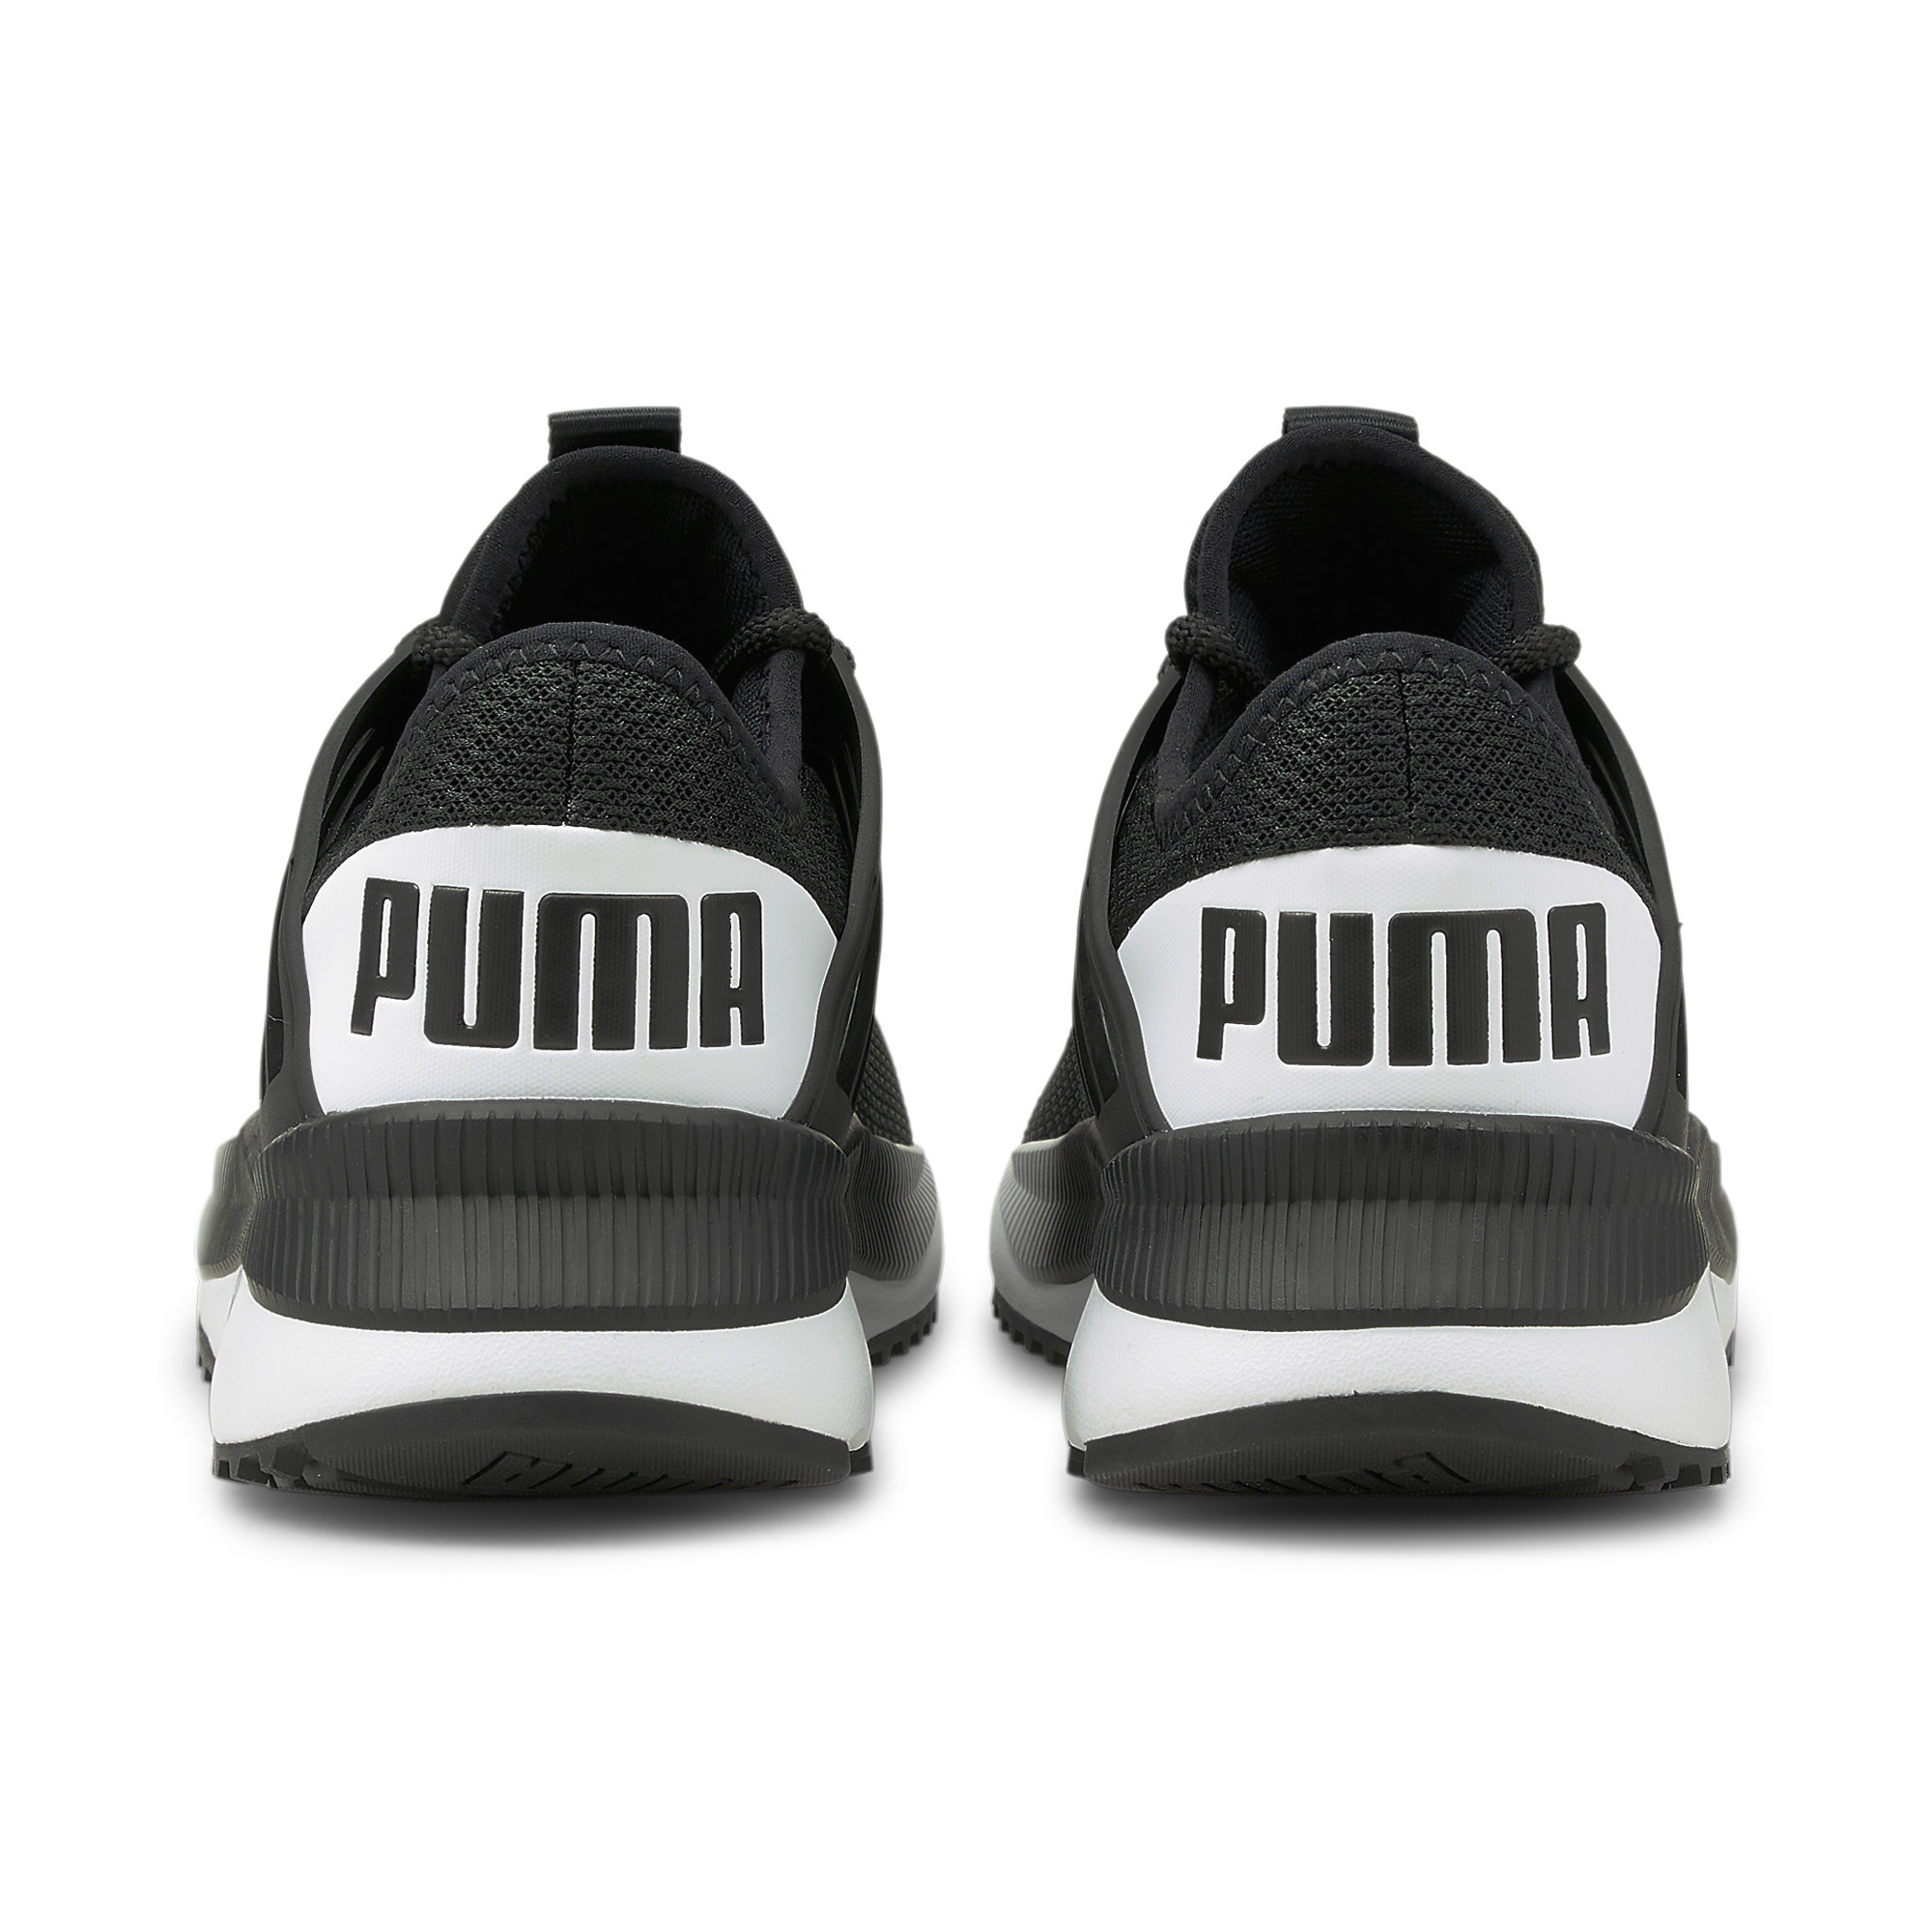 thumbnail 14 - PUMA Men's Pacer Future Classic Sneakers